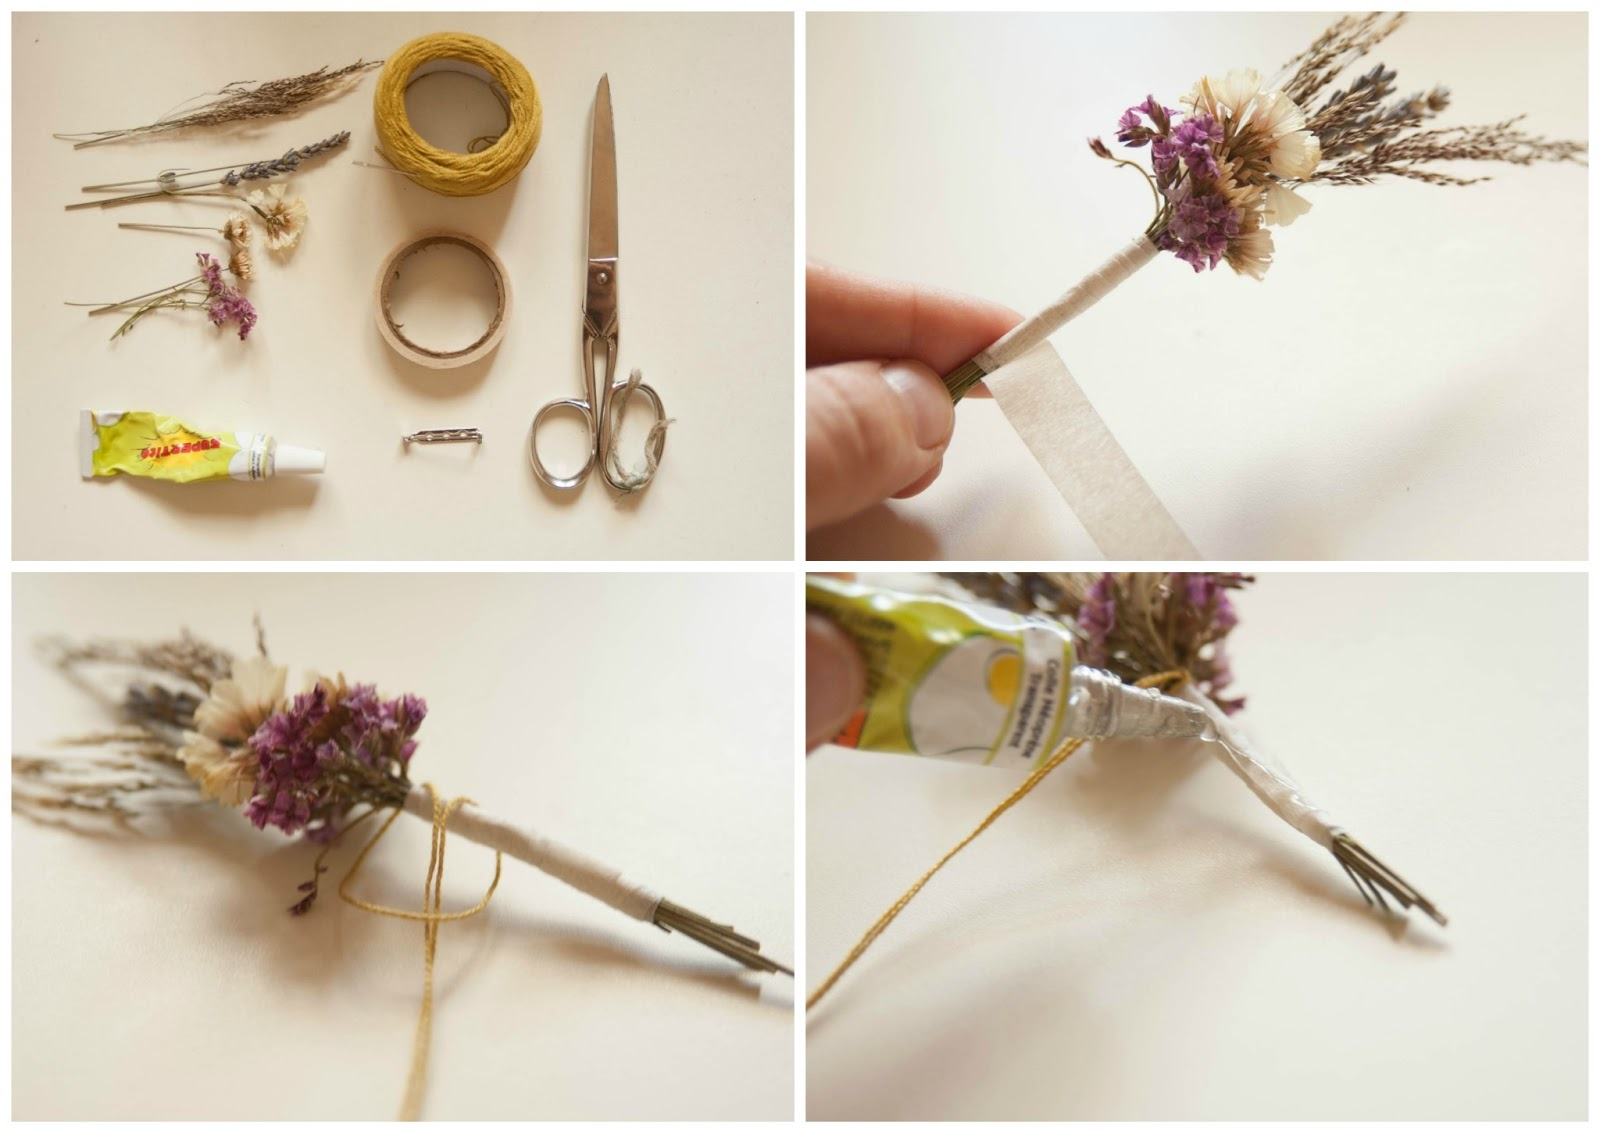 darabil DIY dry flower brooch